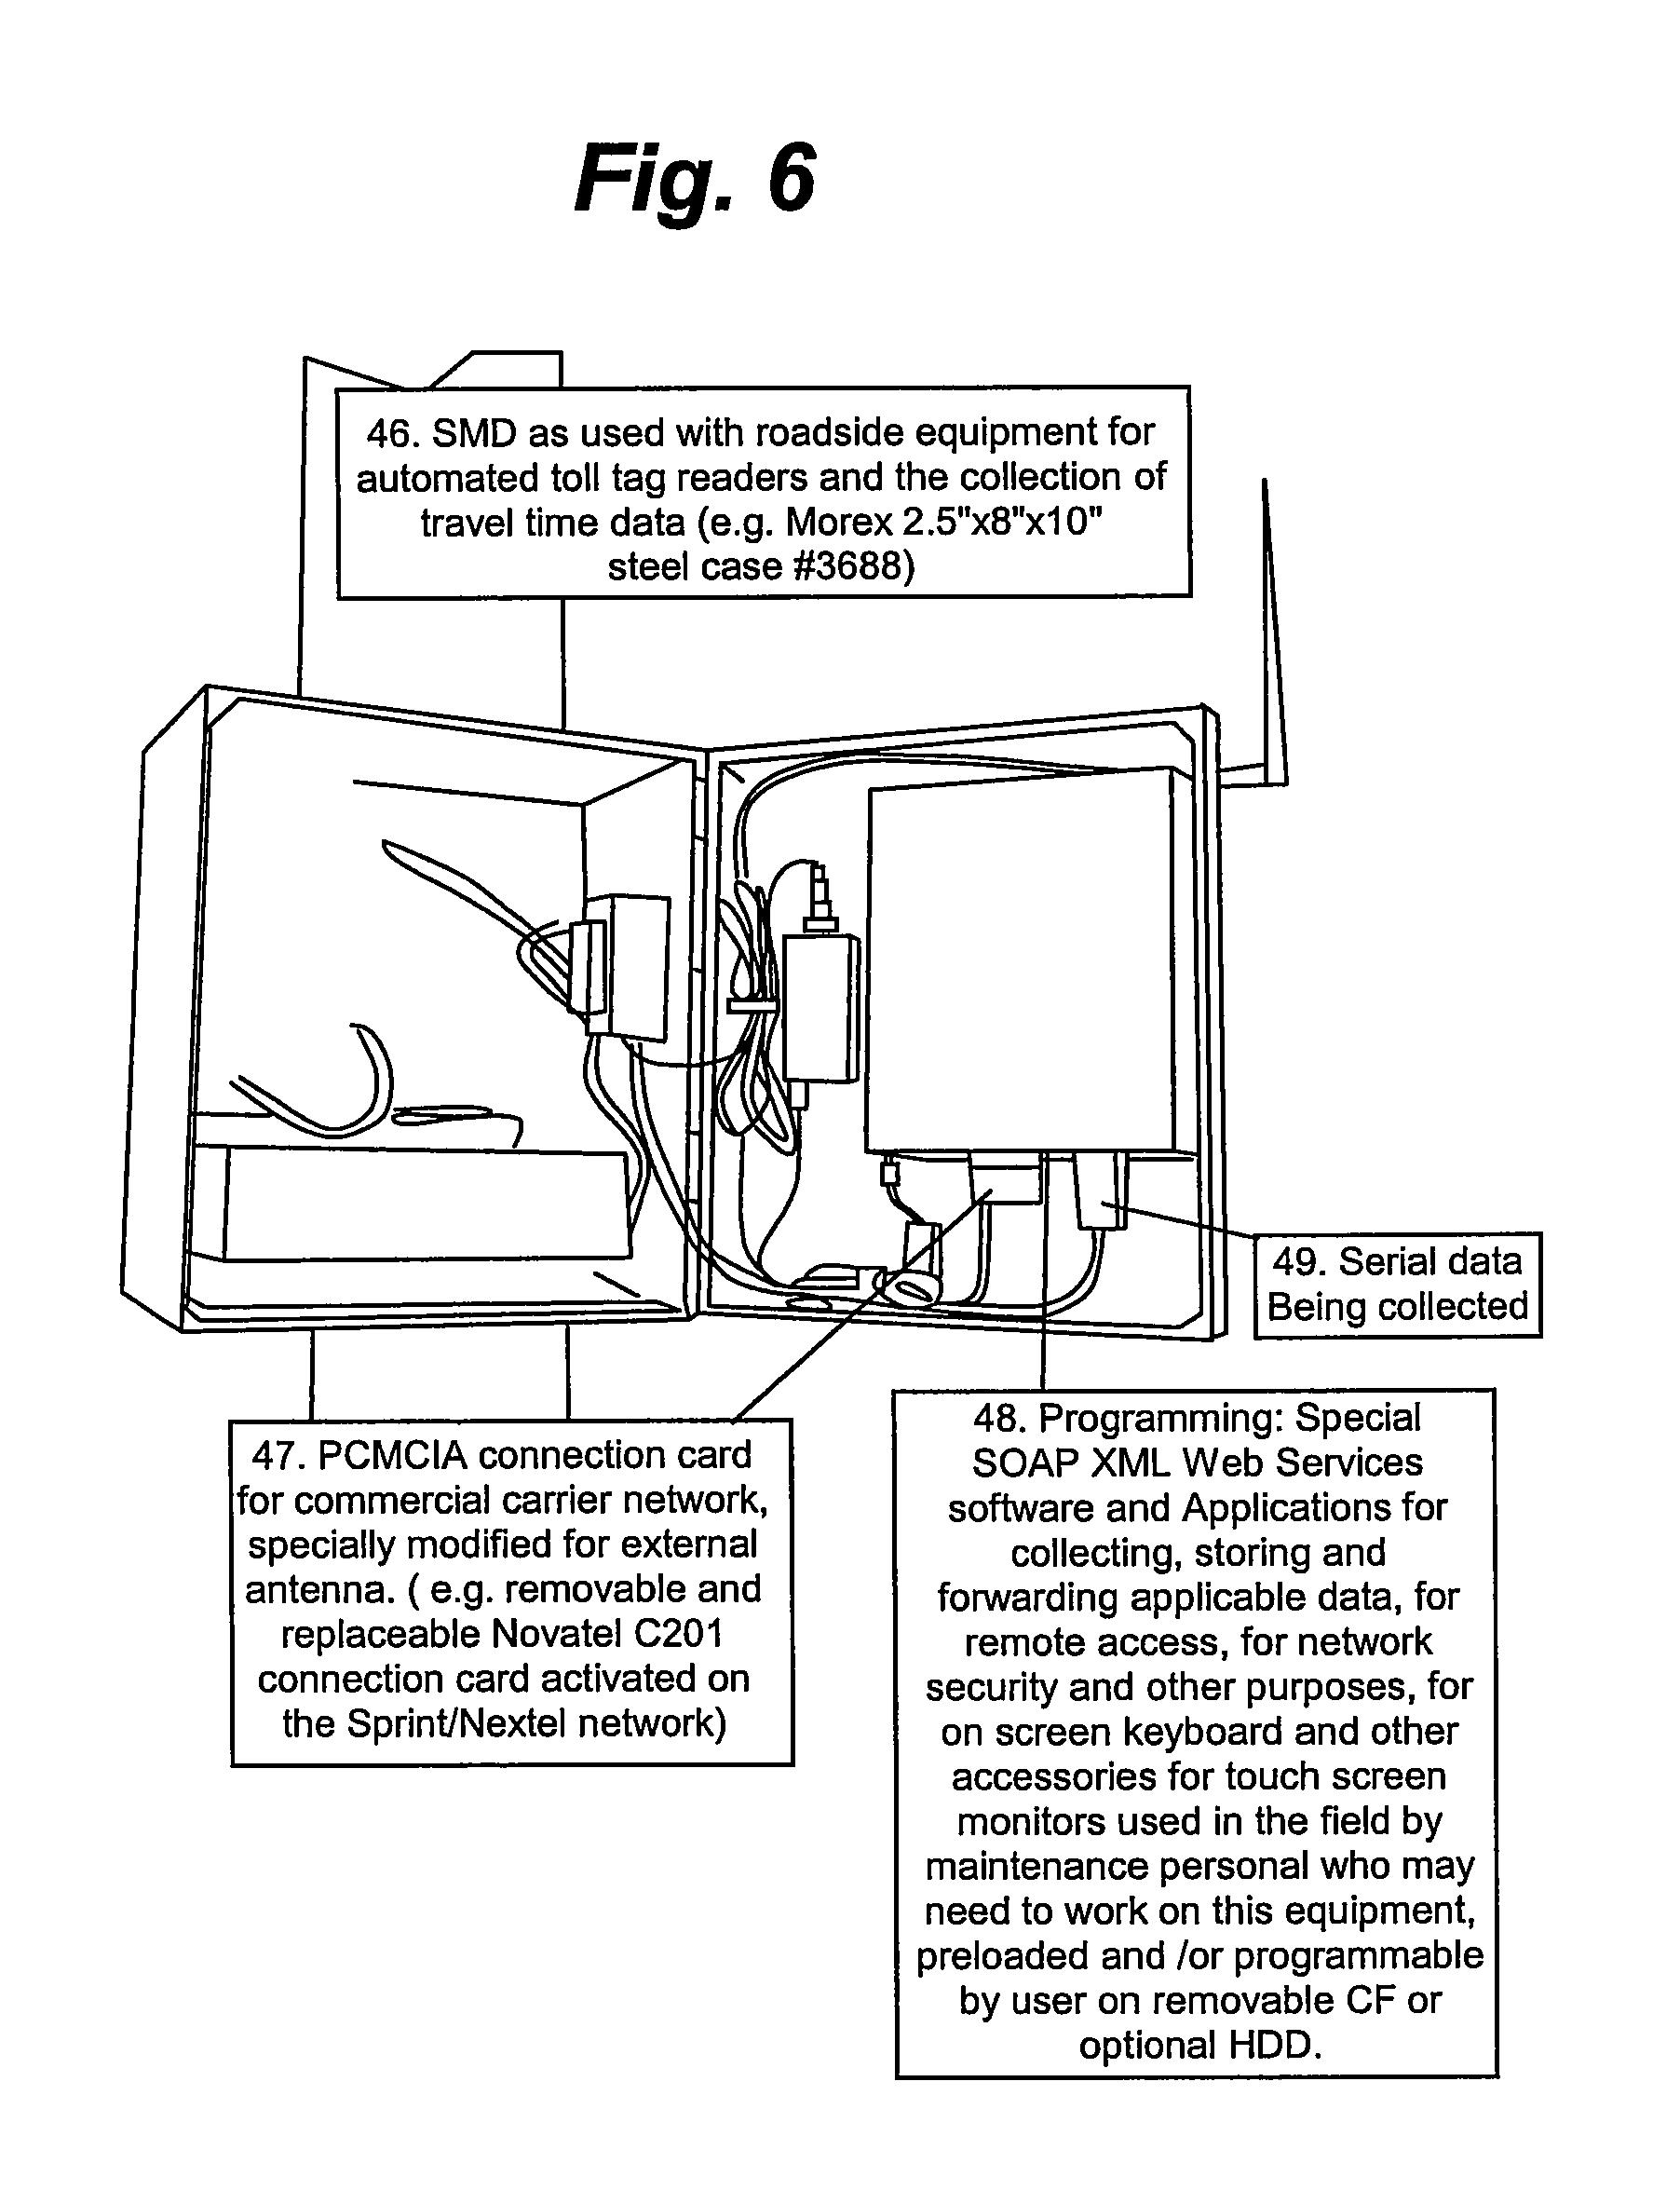 Patent US 8,120,473 B2